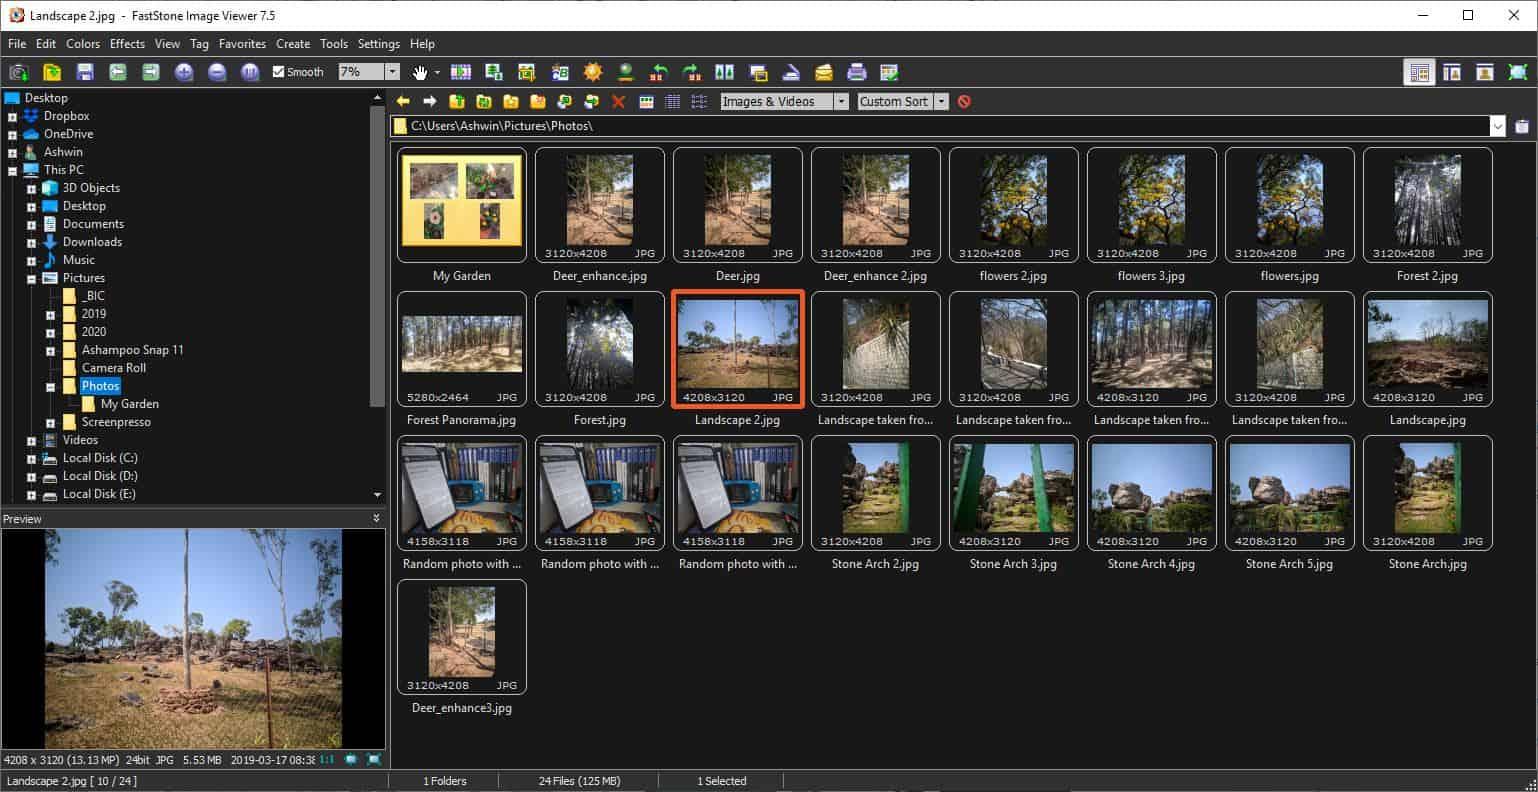 FastStone Image Viewer dark theme